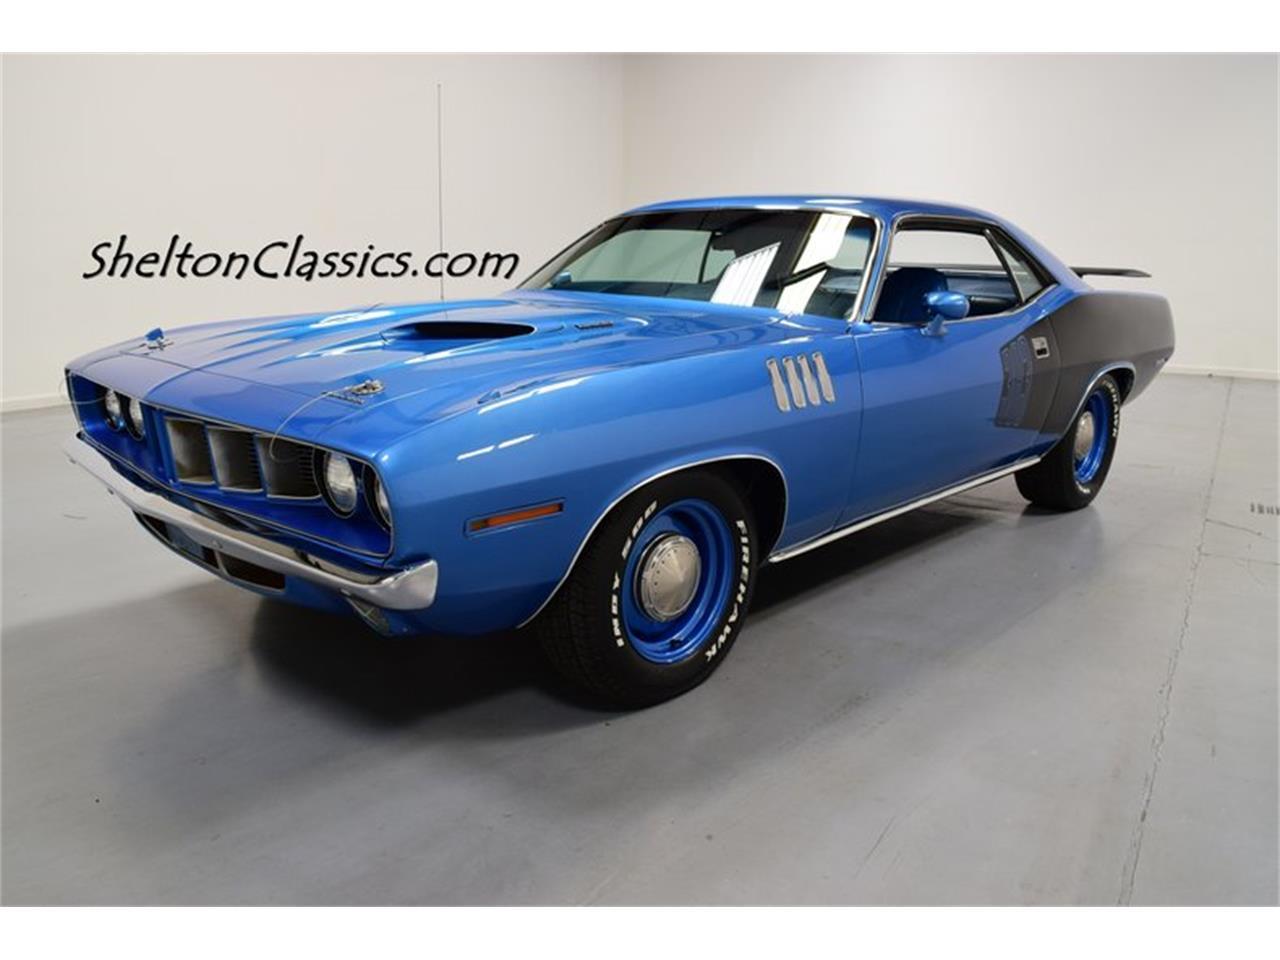 For Sale: 1971 Plymouth Cuda in Mooresville, North Carolina